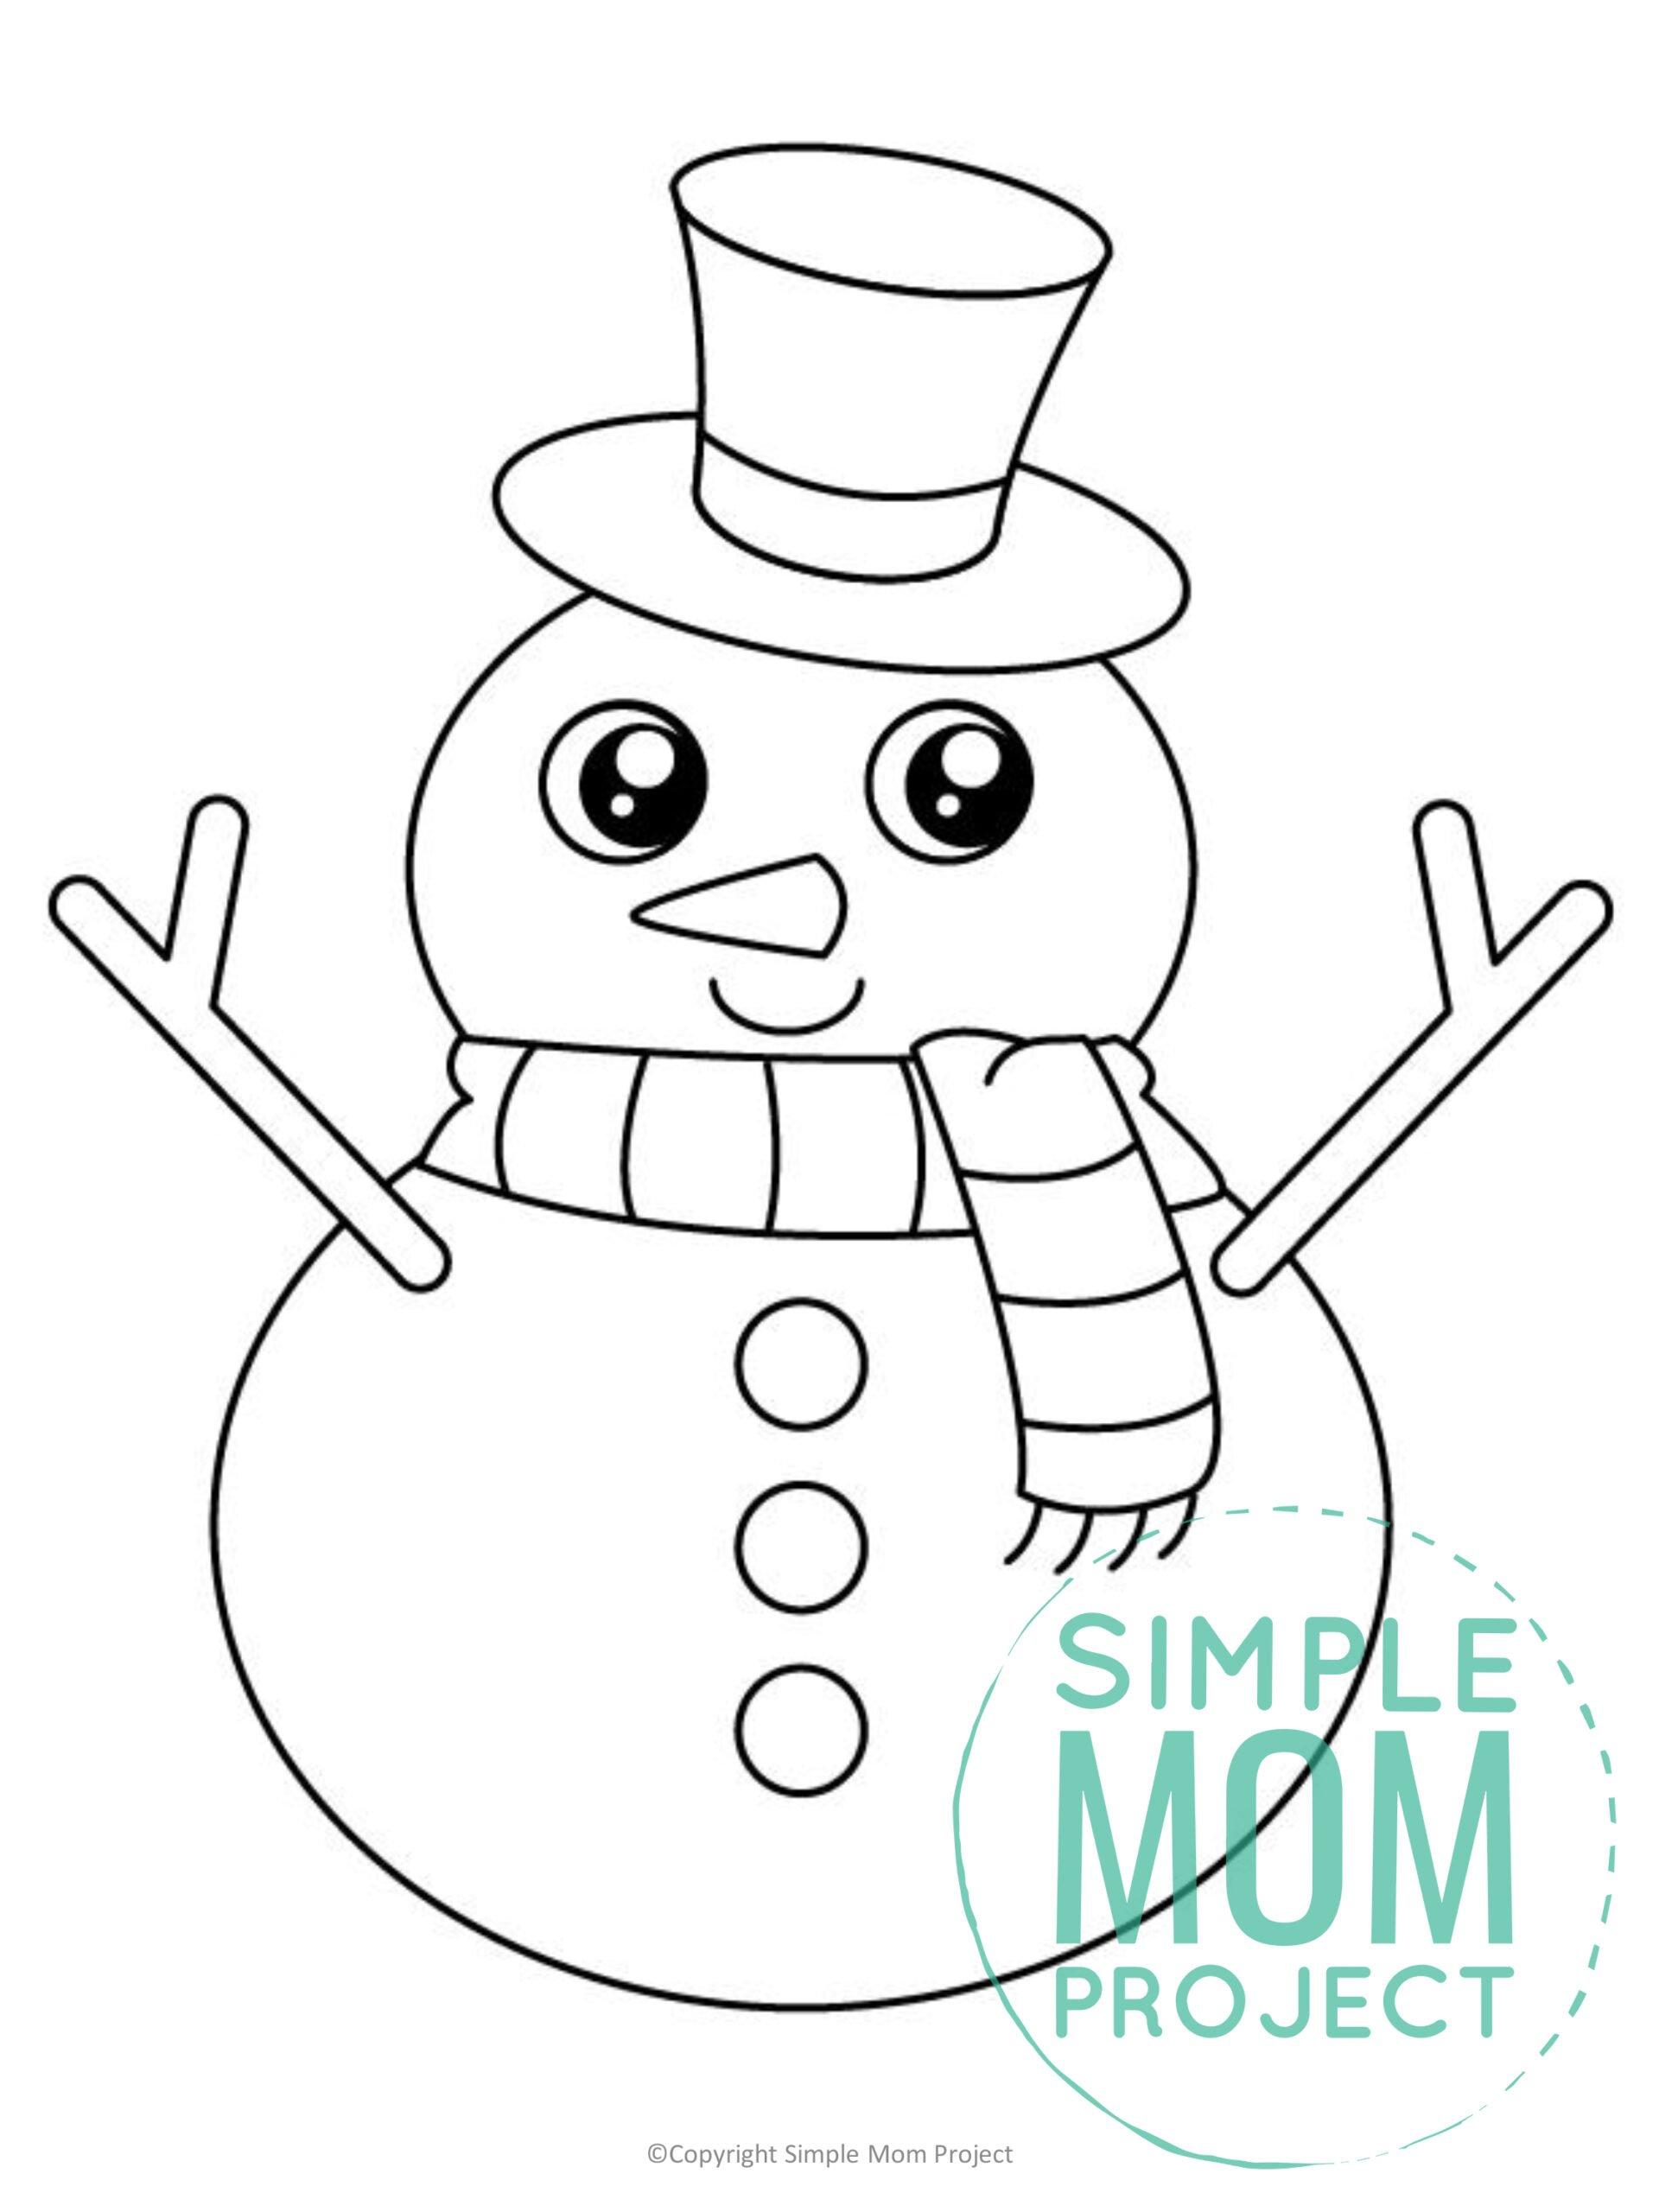 Free Printable Snowman Template for kids preschoolers toddlers